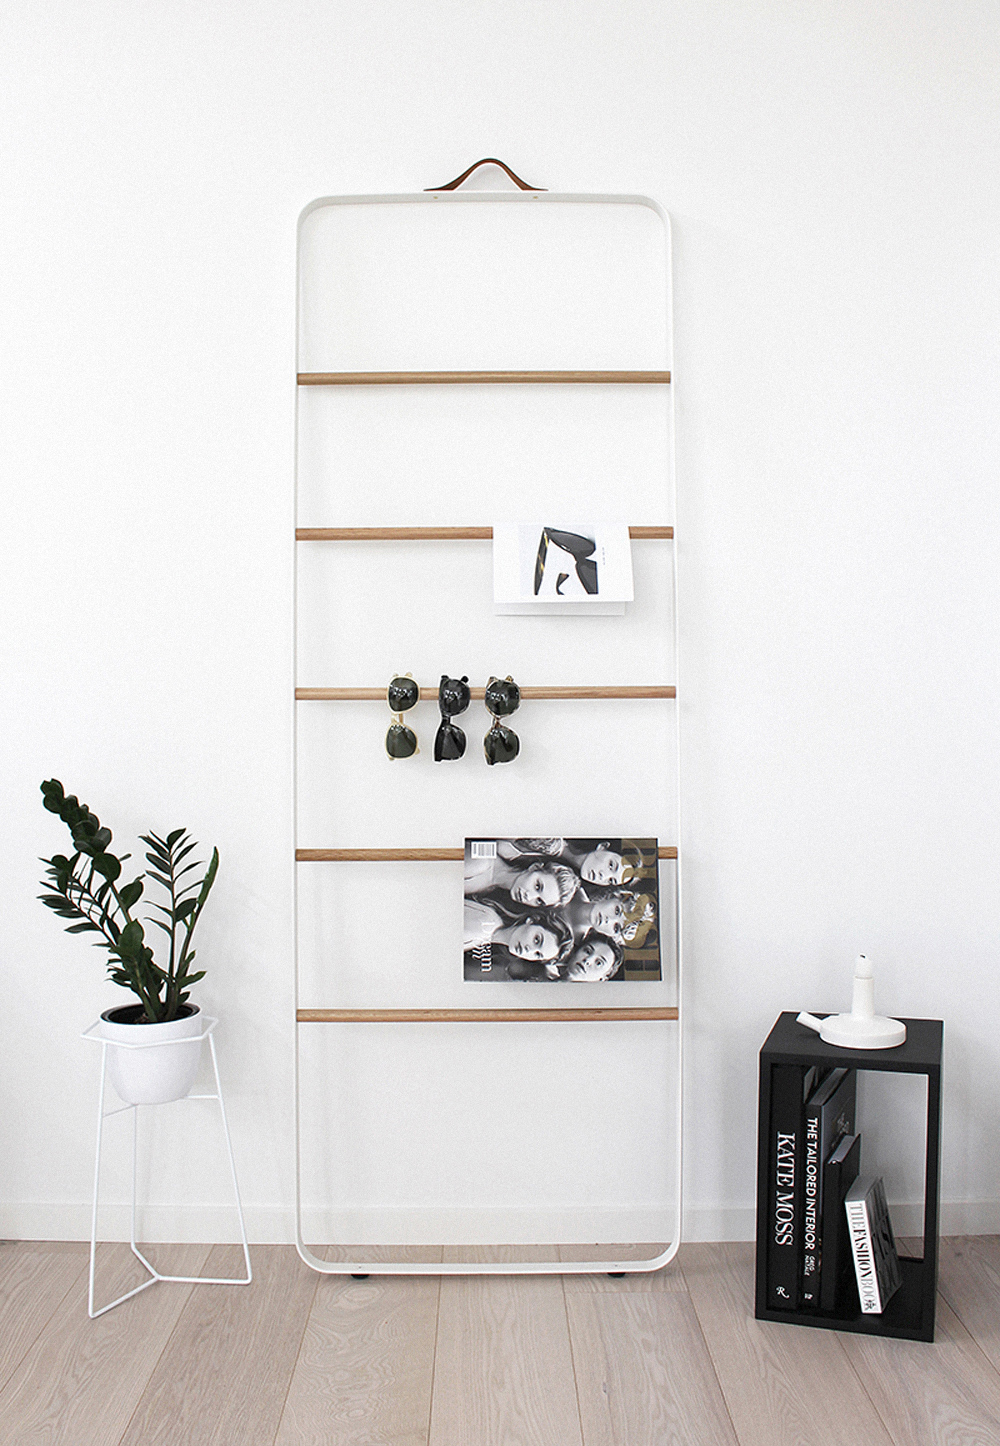 Oracle, Fox, Sunday, Sanctuary, Art, Wall, gallery, Wall, Interior, Library, Wall, Fashion, Inspiration, Wall